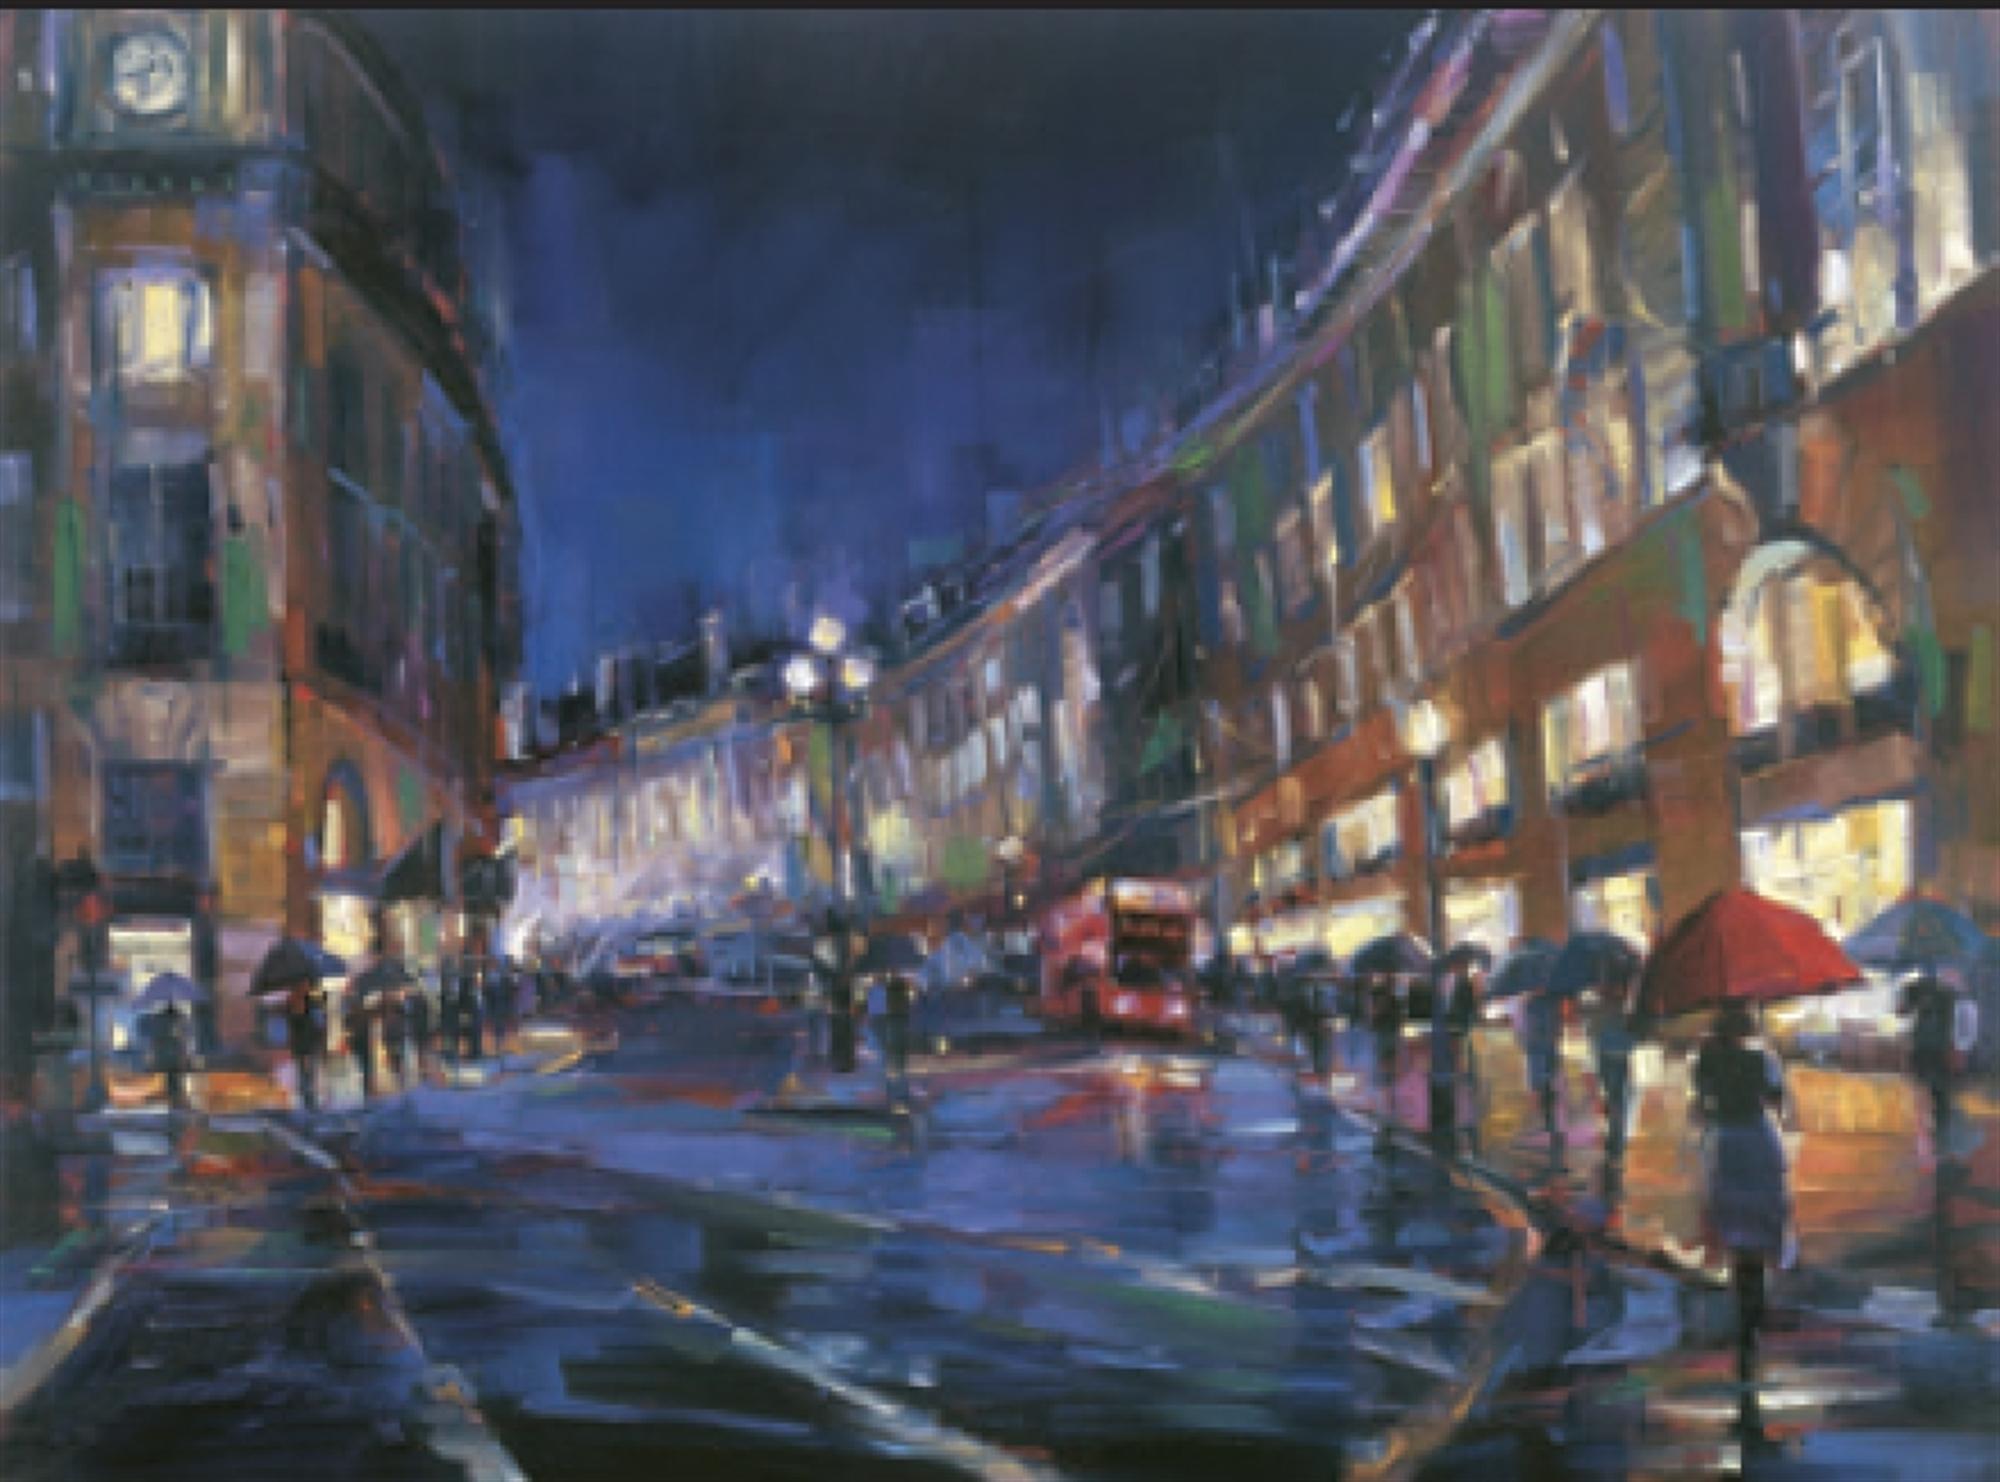 London Rain by Michael Flohr